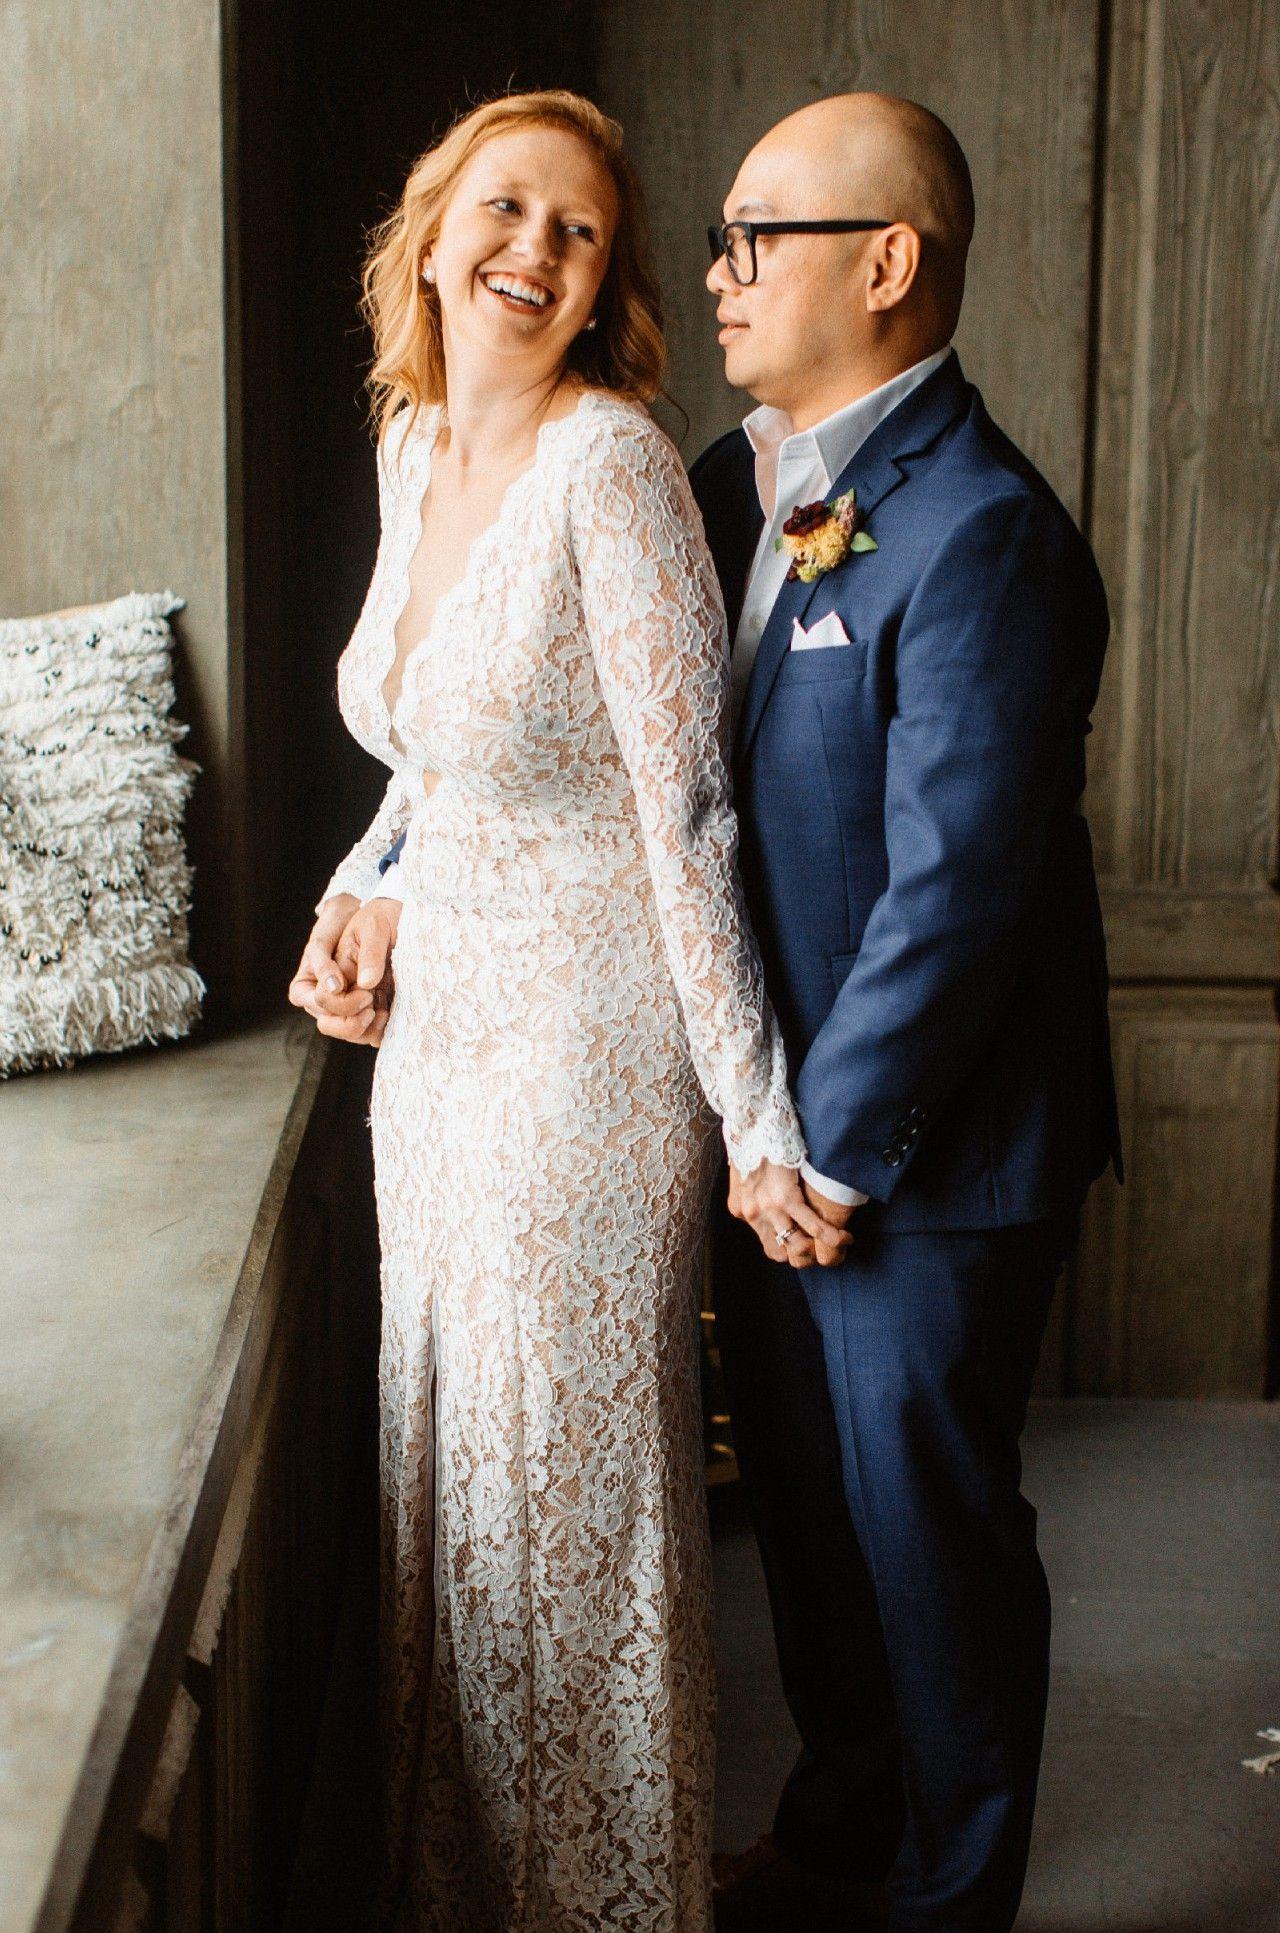 Tadashi Shoji Miraval Gown Used Wedding Dress Save 50 Tadashi Shoji Wedding Dress Dresses Used Wedding Dresses [ 1933 x 1280 Pixel ]